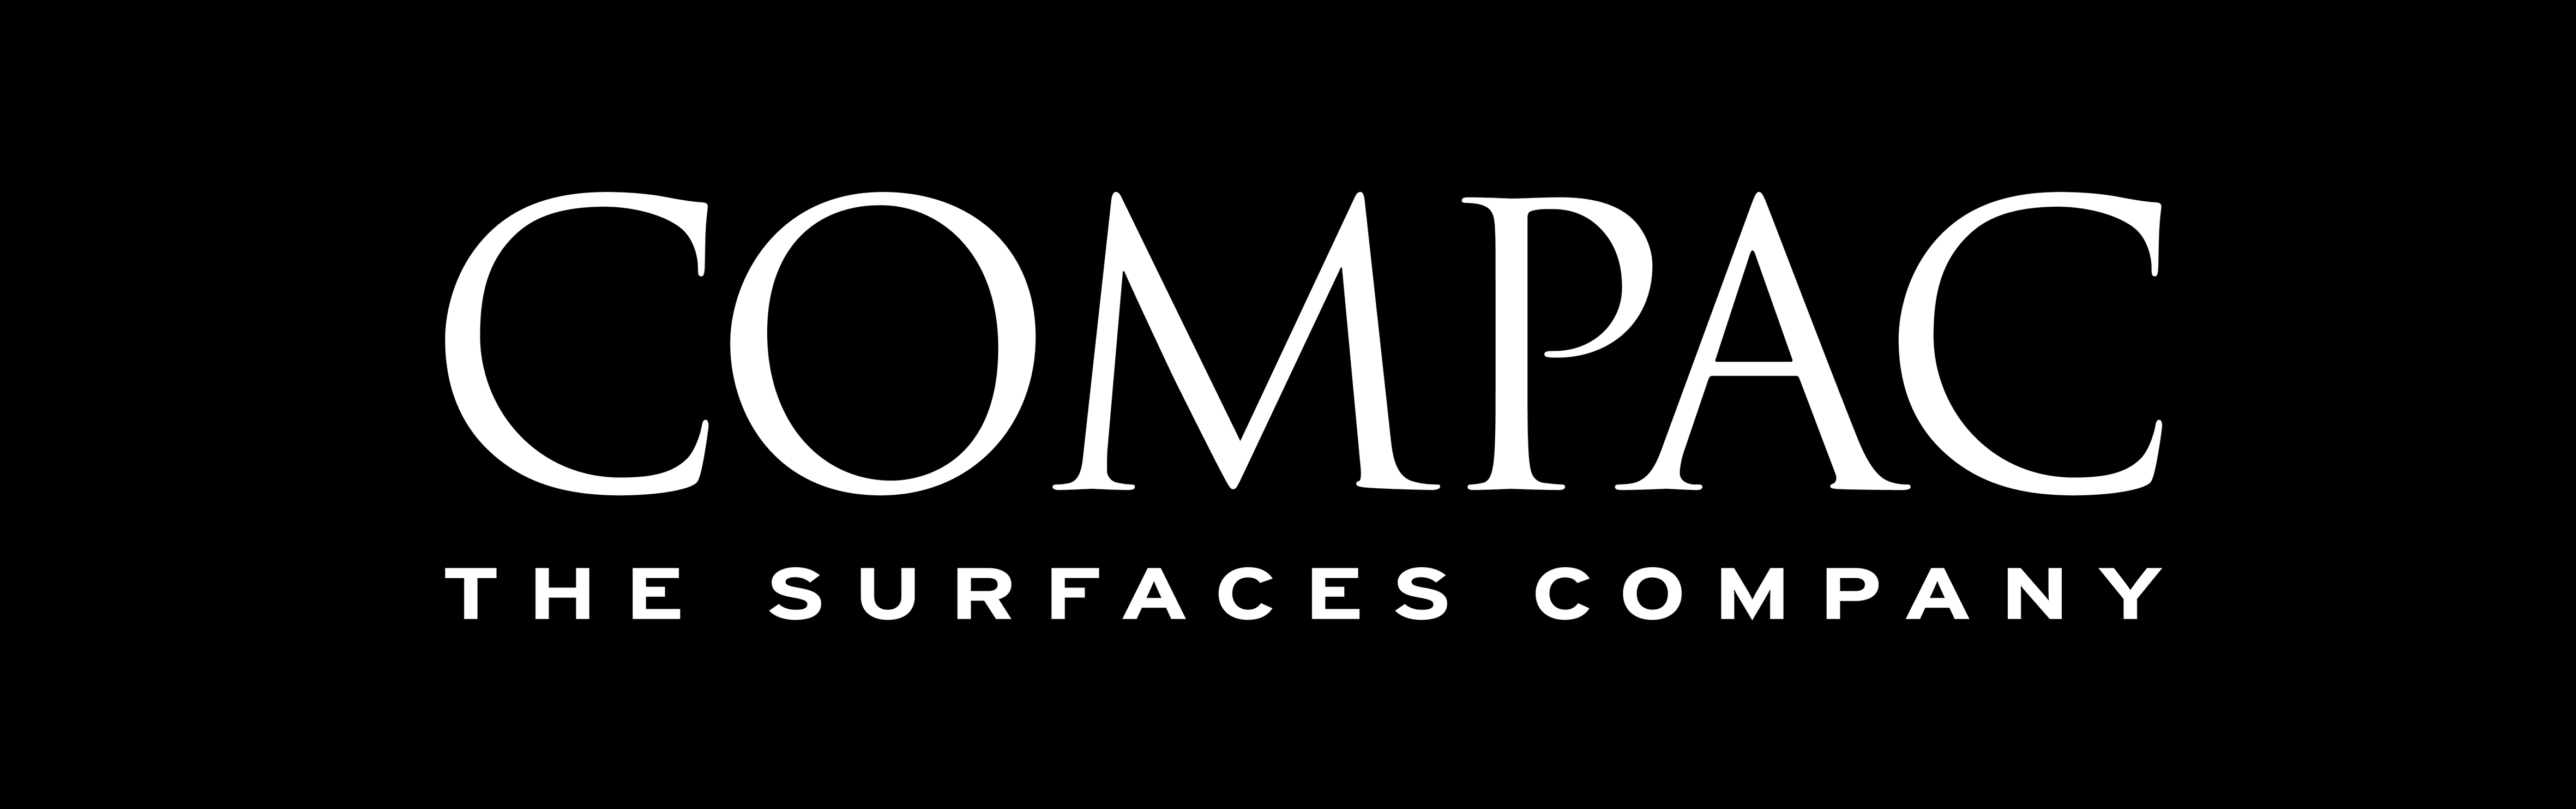 Logo Compac sin fondo